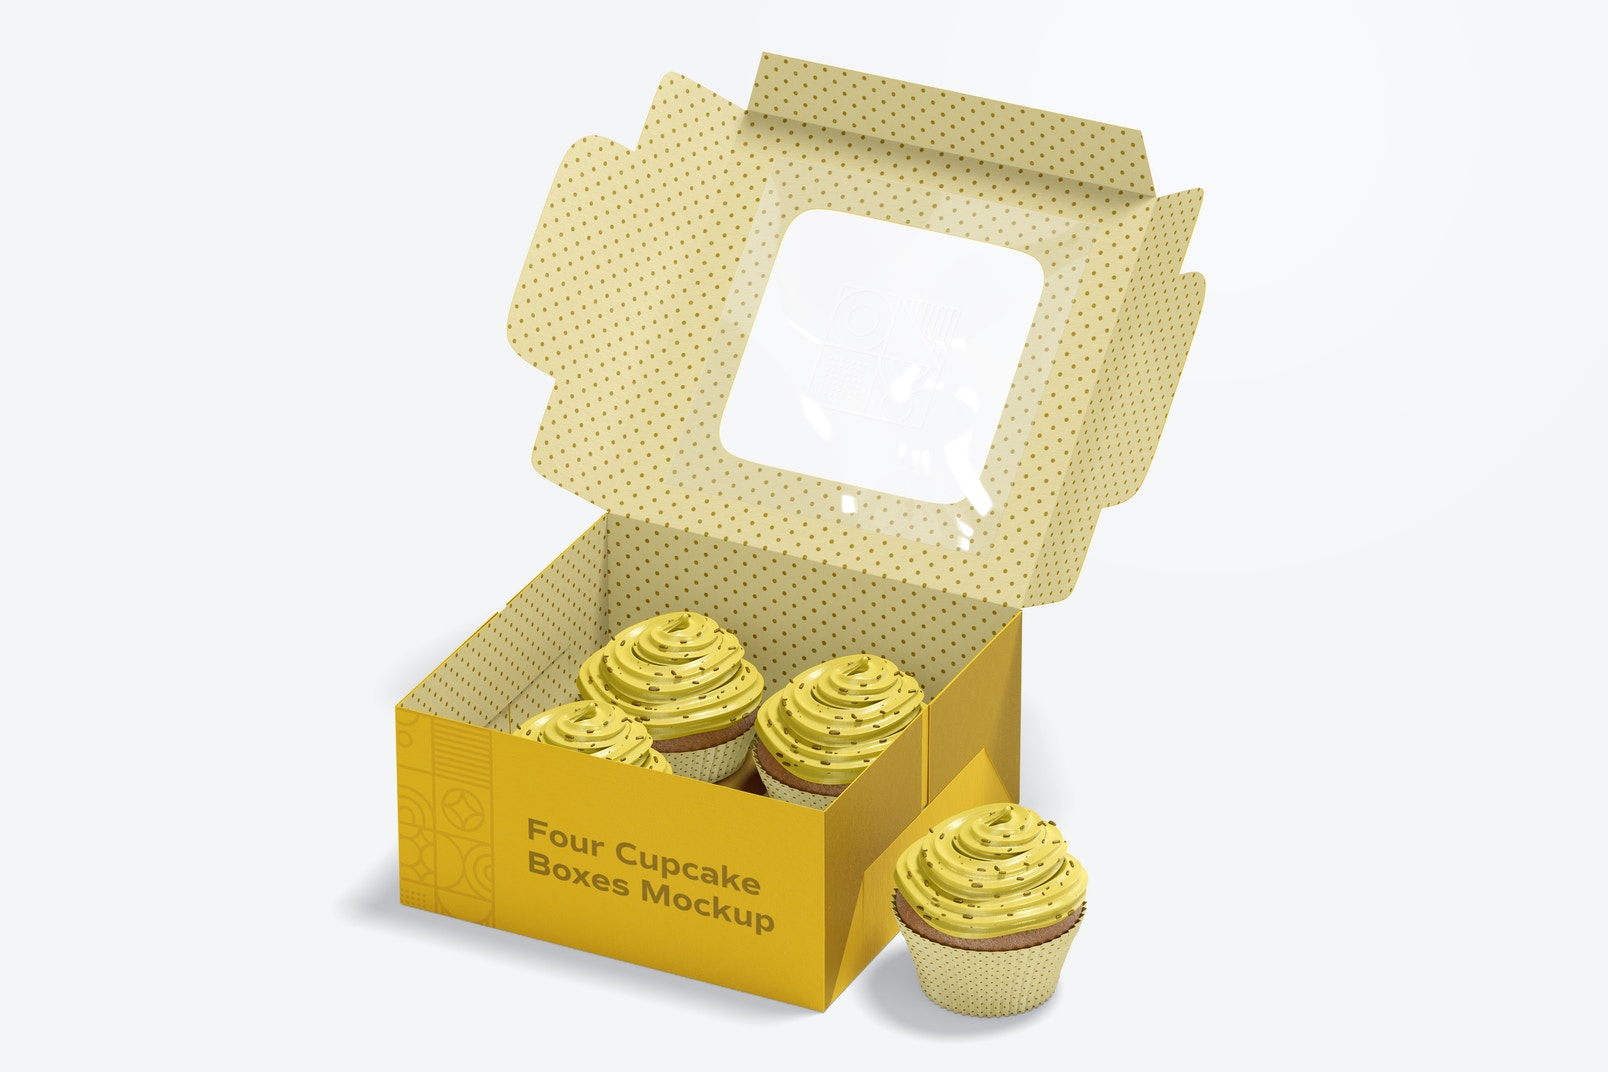 Four Cupcakes Box Mockup, Opened